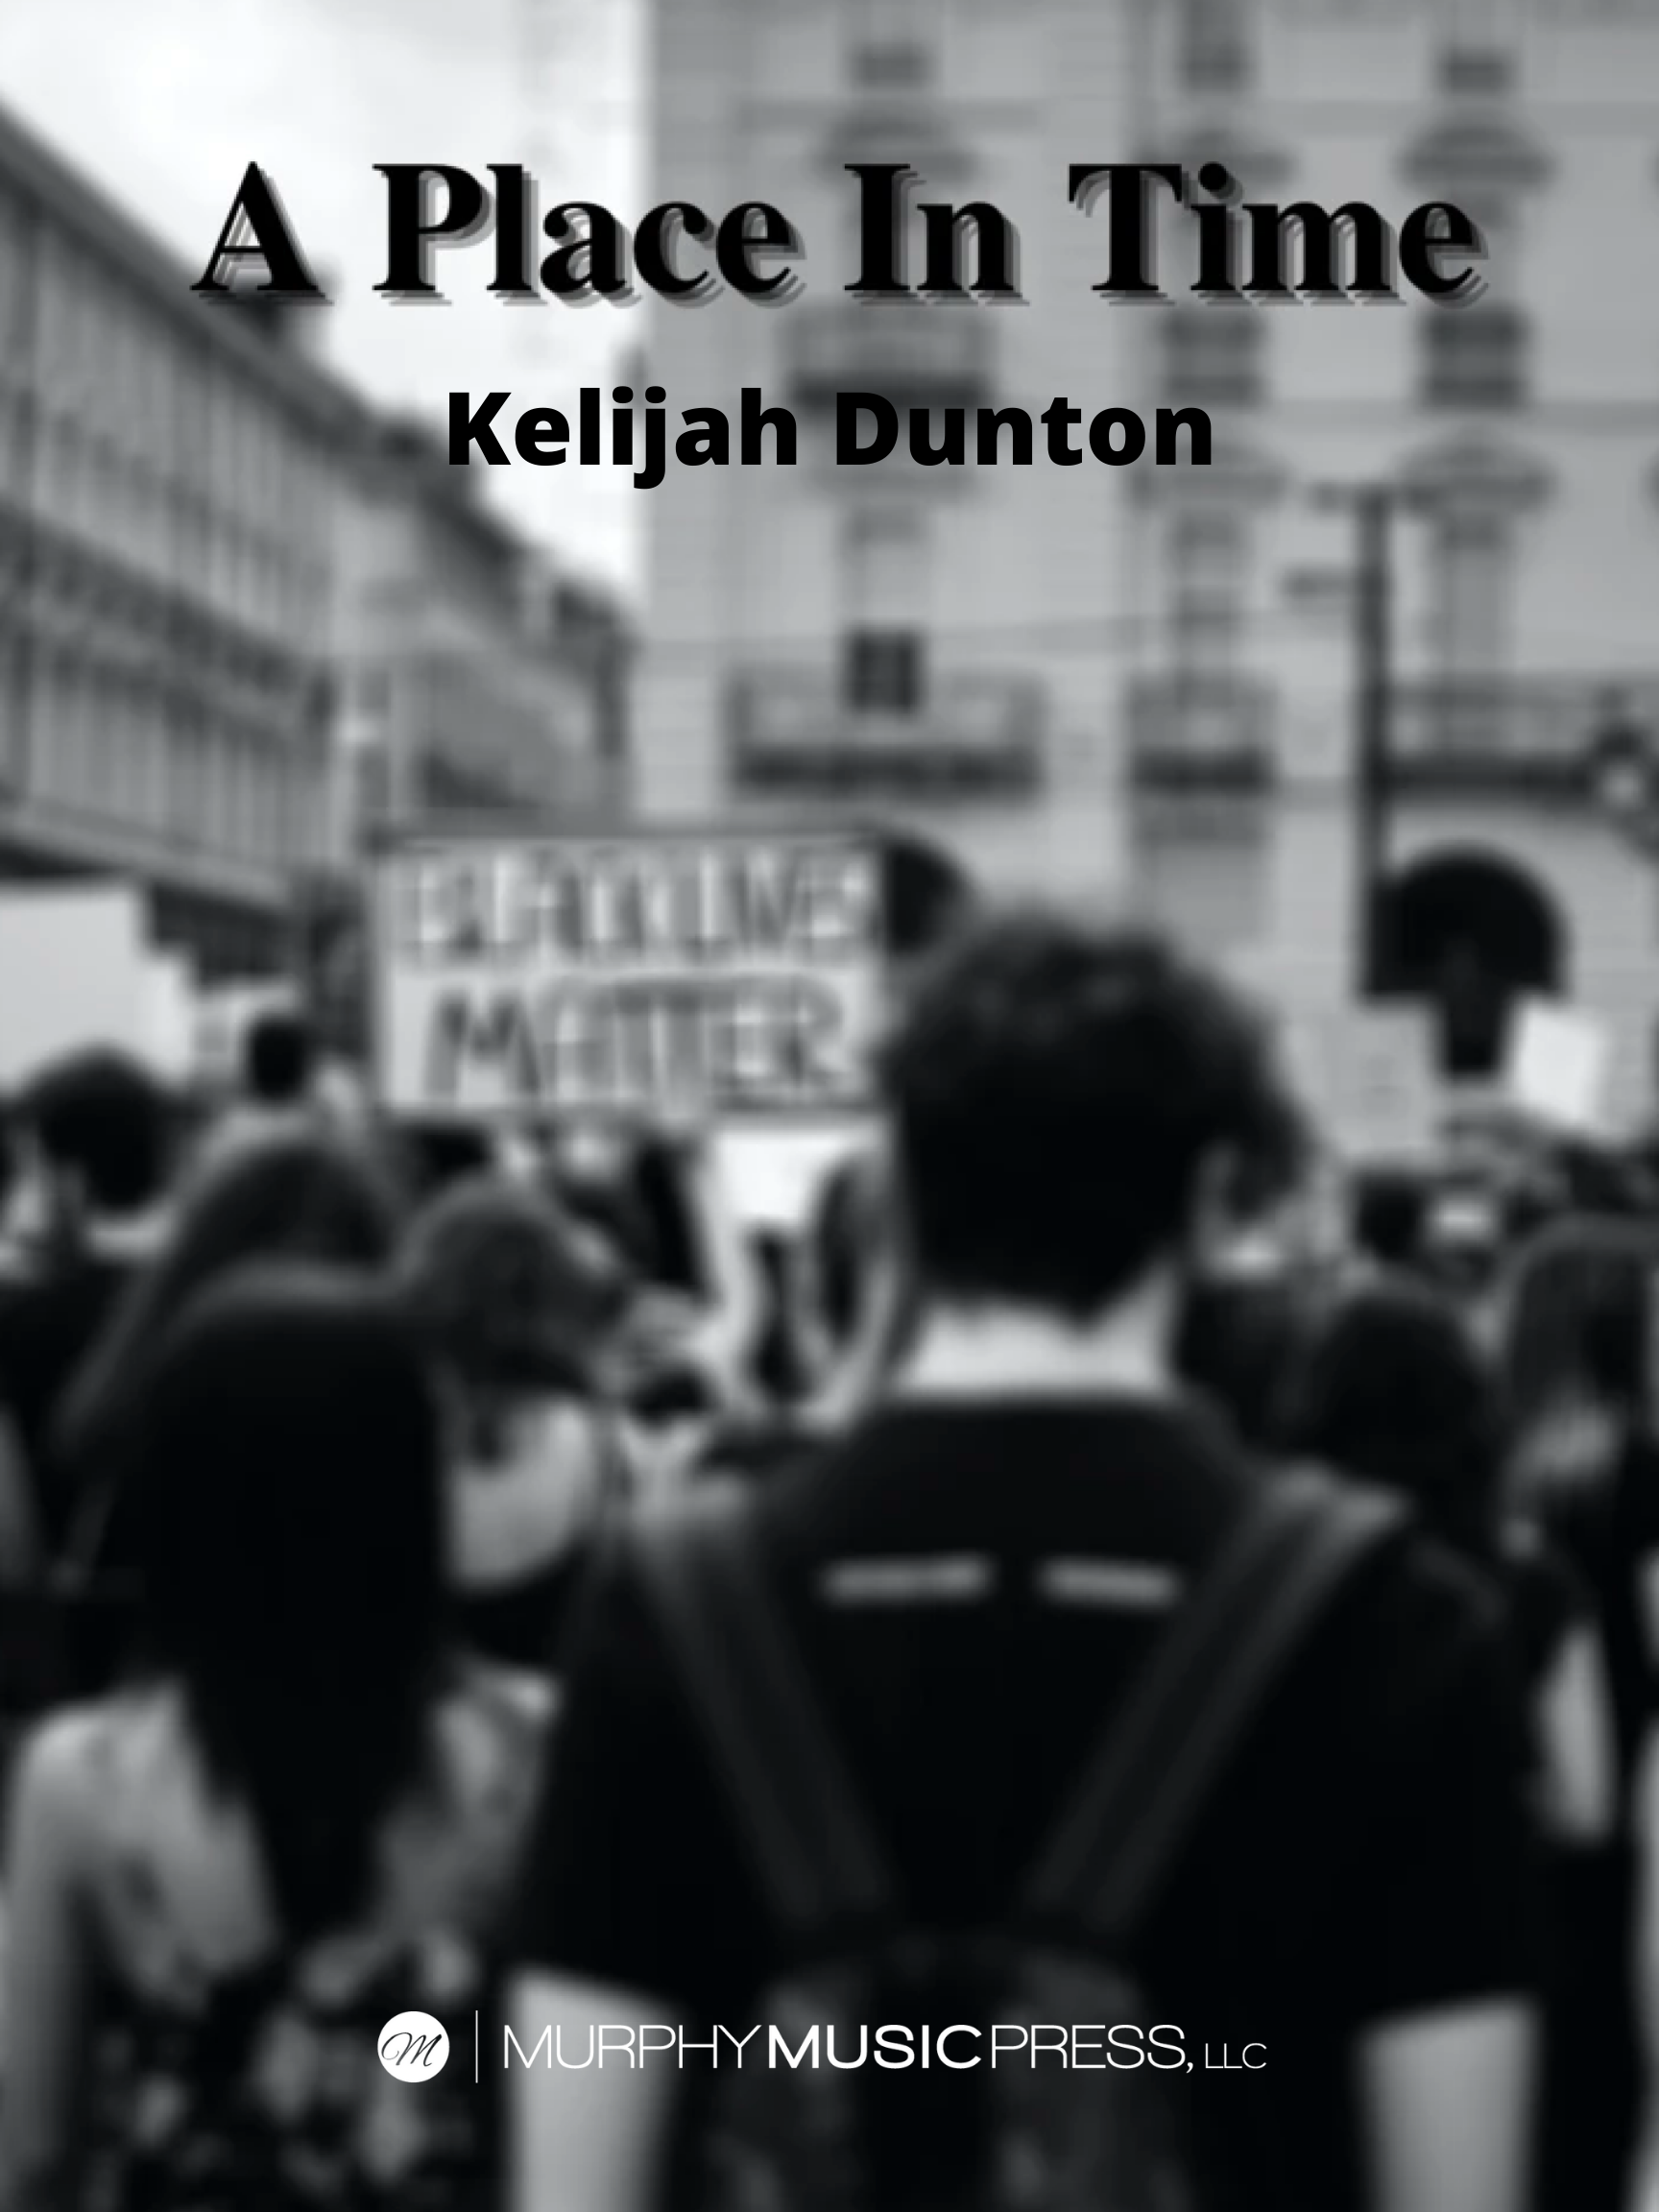 A Place In Time by Kelijah Dunton